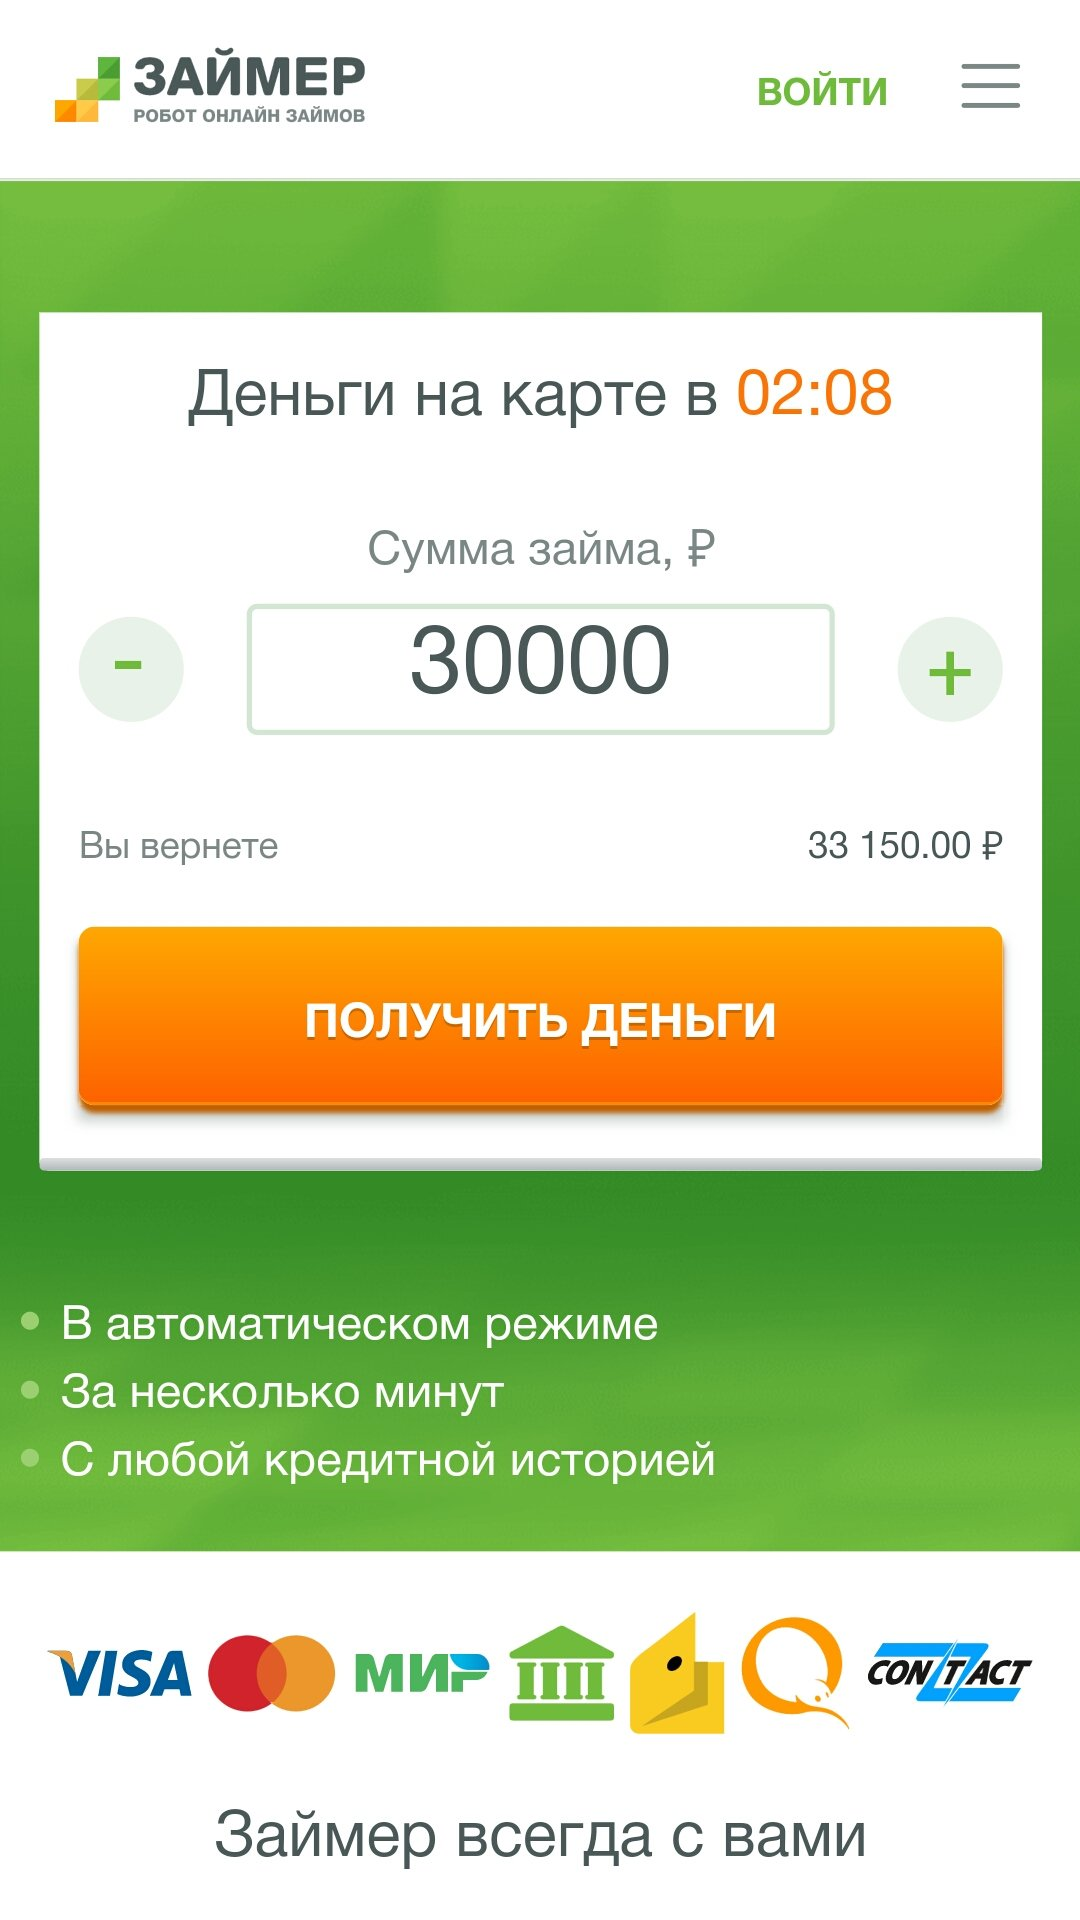 онлайн займы на карту срочно займер